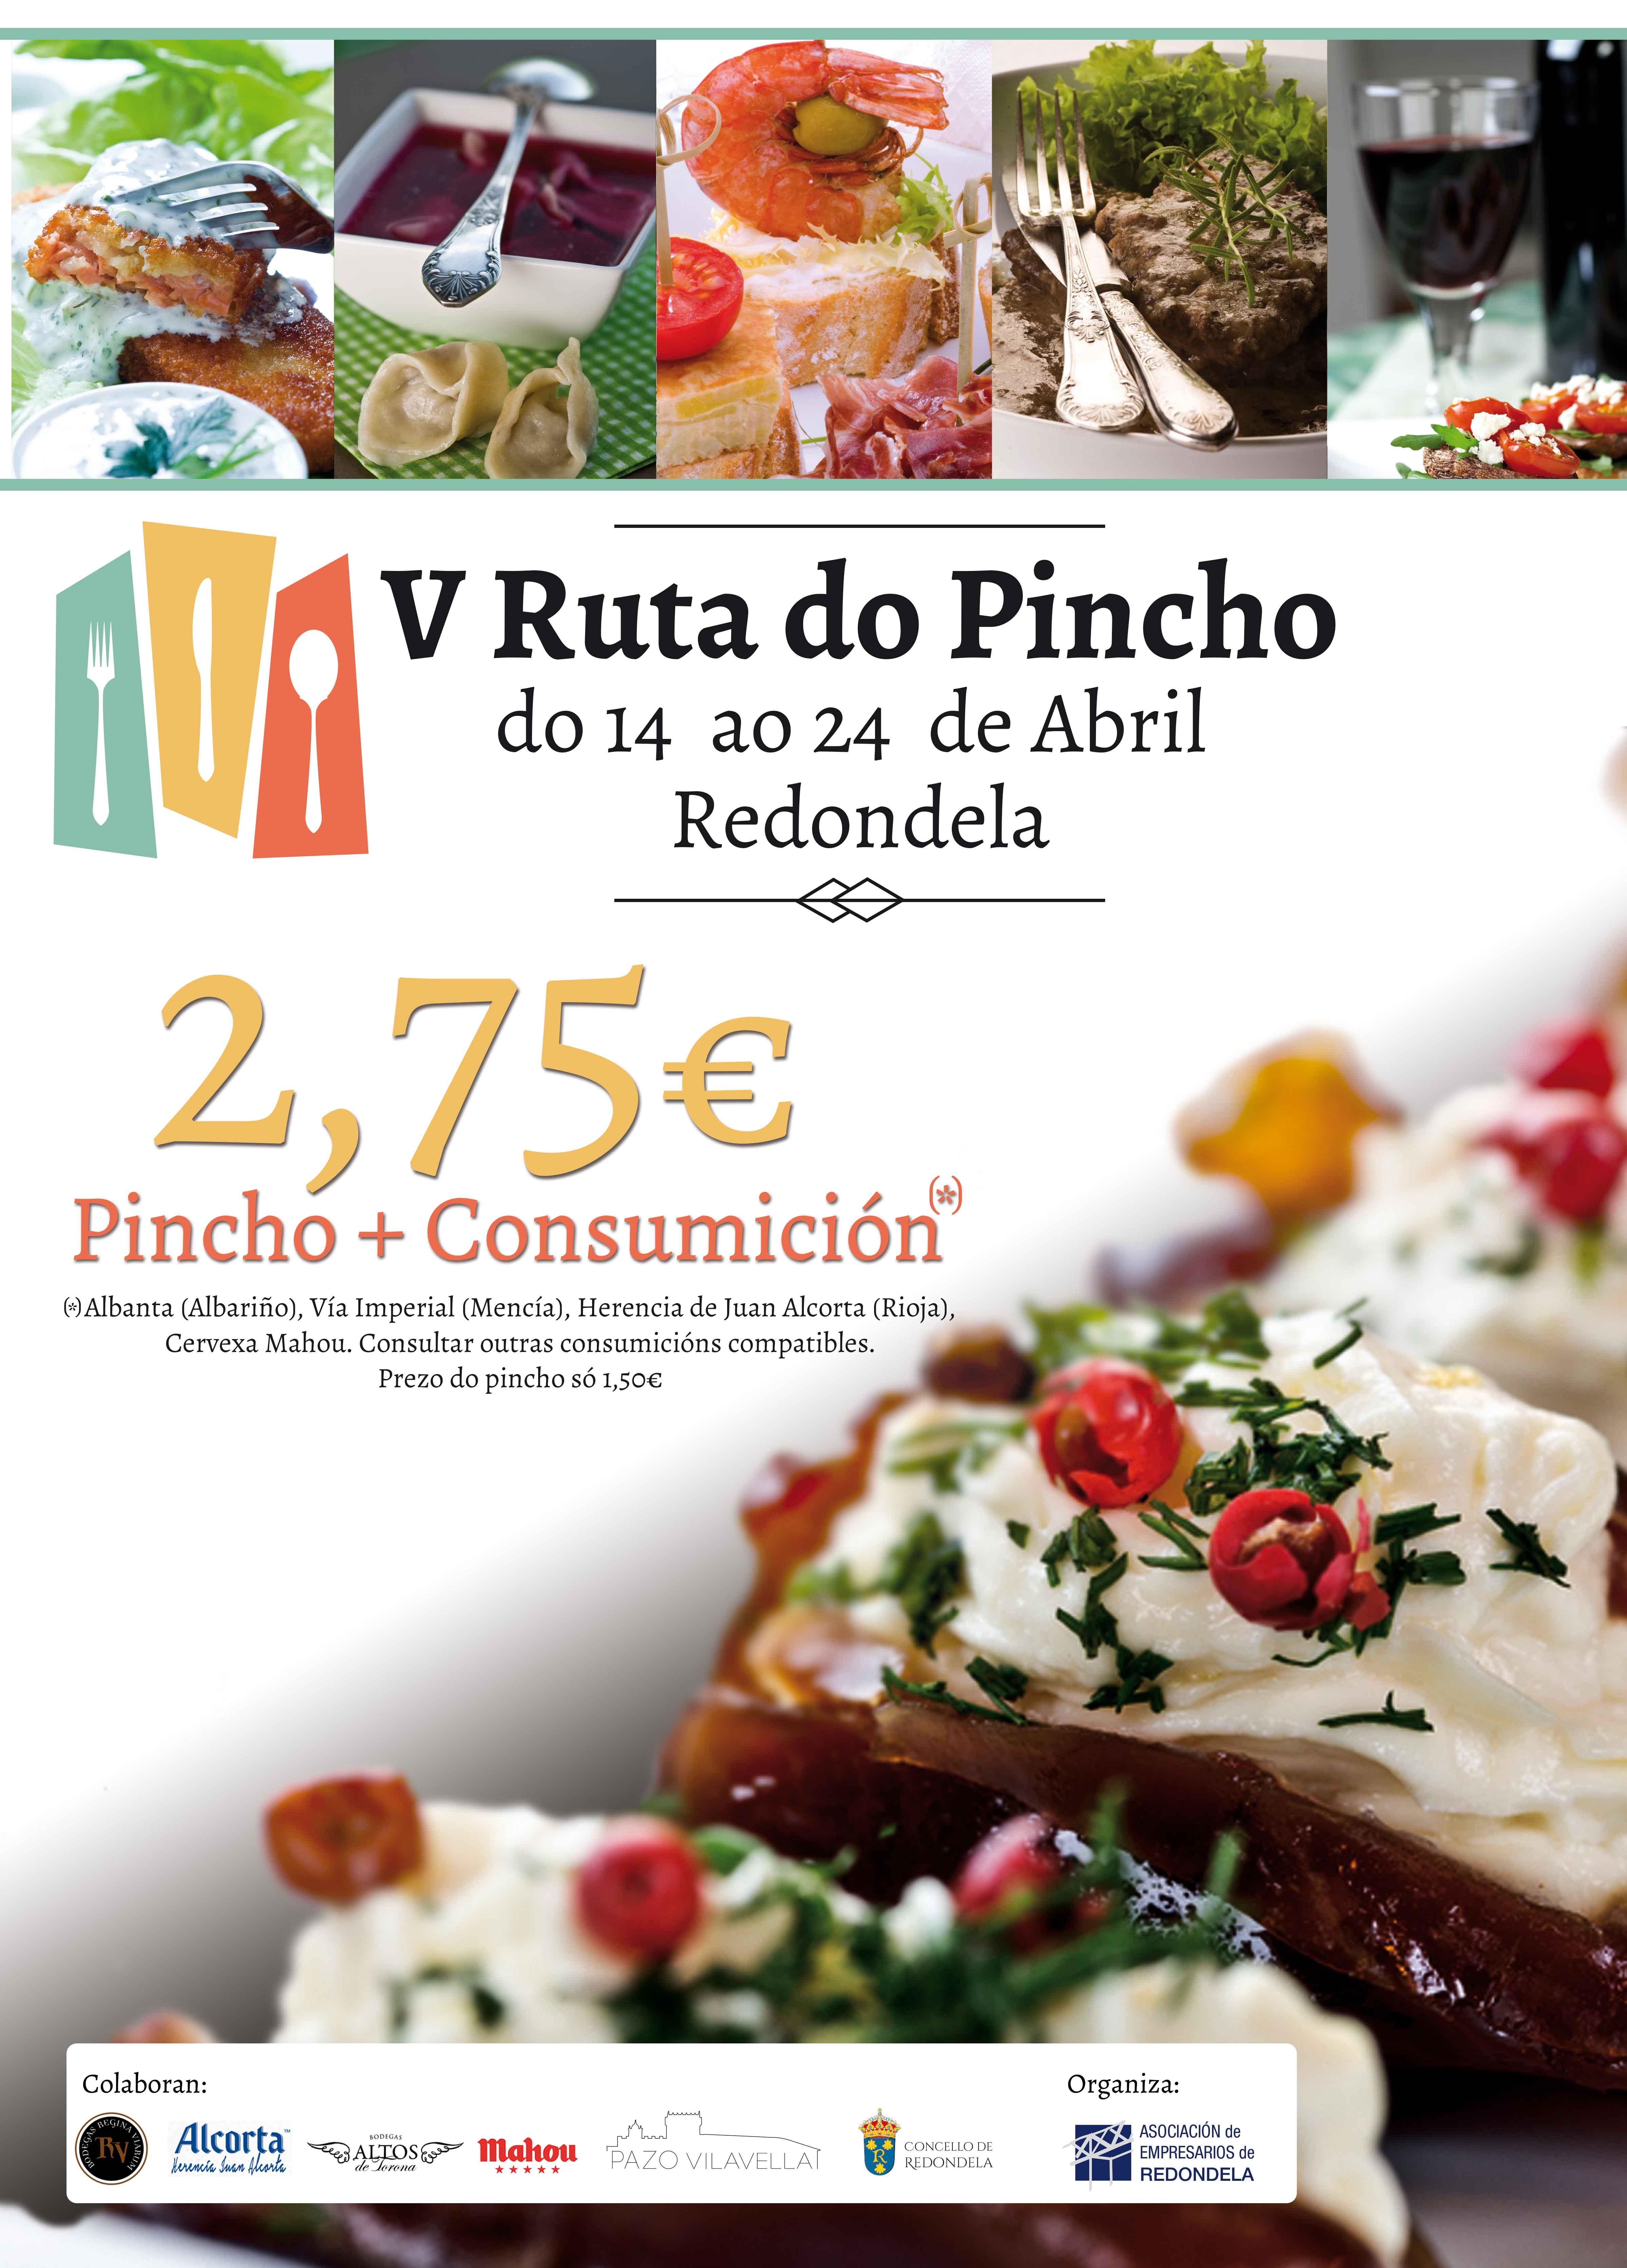 RUTA PINCHO REDONDELA 2016